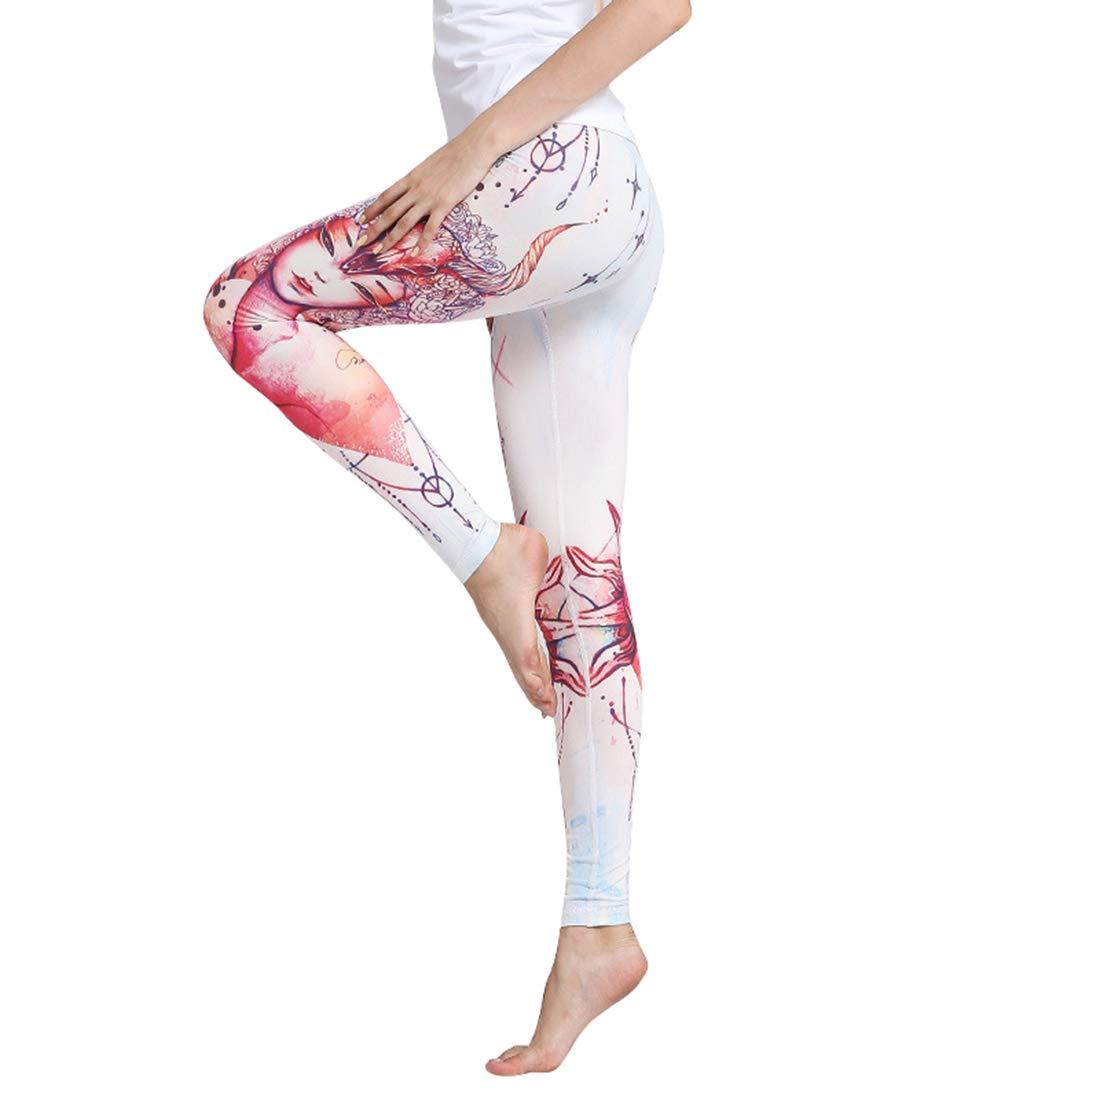 A003 Huayue Yoga Pants Women's Printed Elastic Slimming Fitness Pixilated Pants